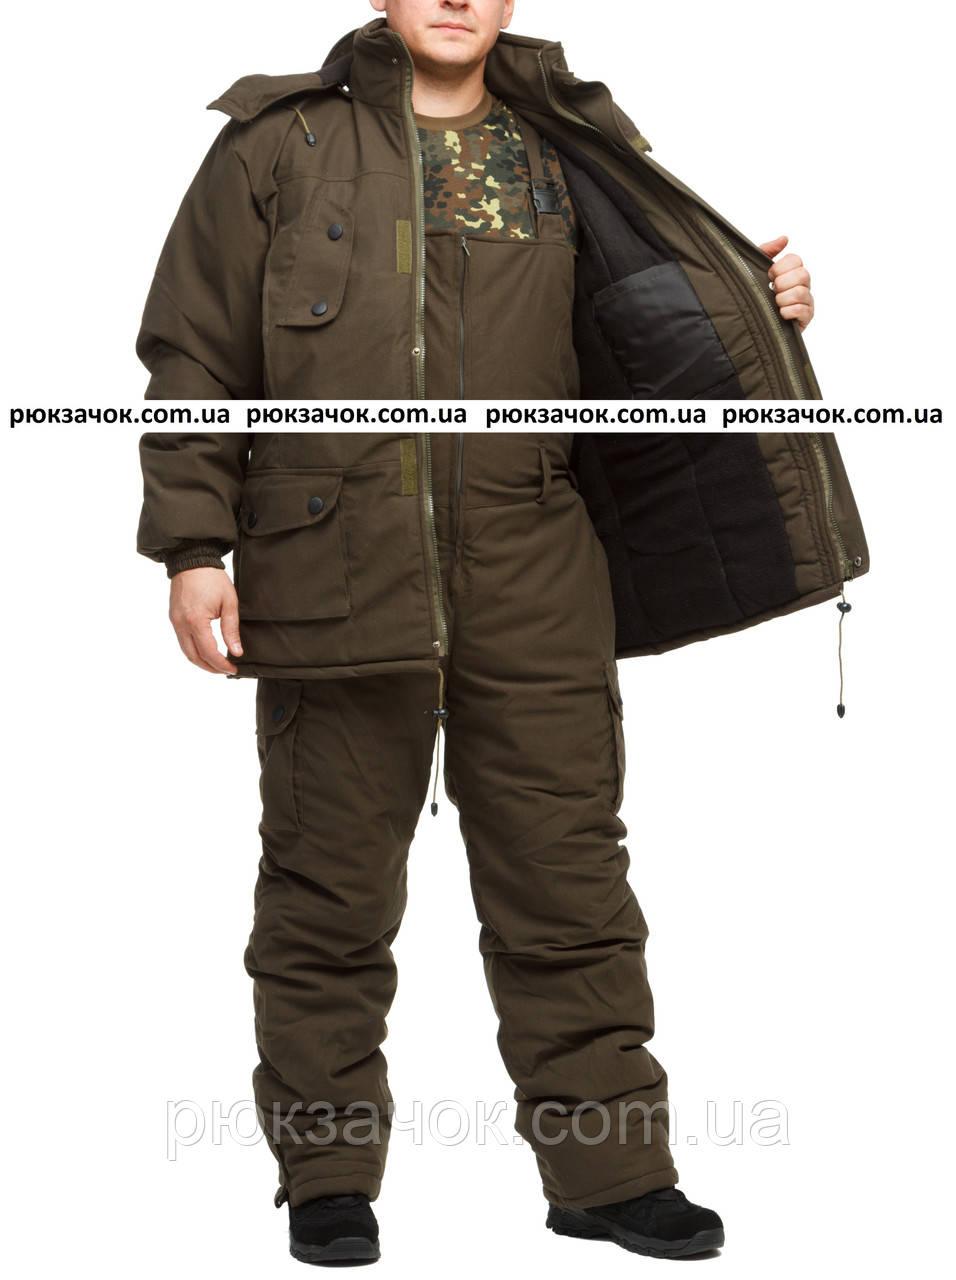 "Костюм для зимней рыбалки ""Олива-хаки"" размер 56-58, фото 1"